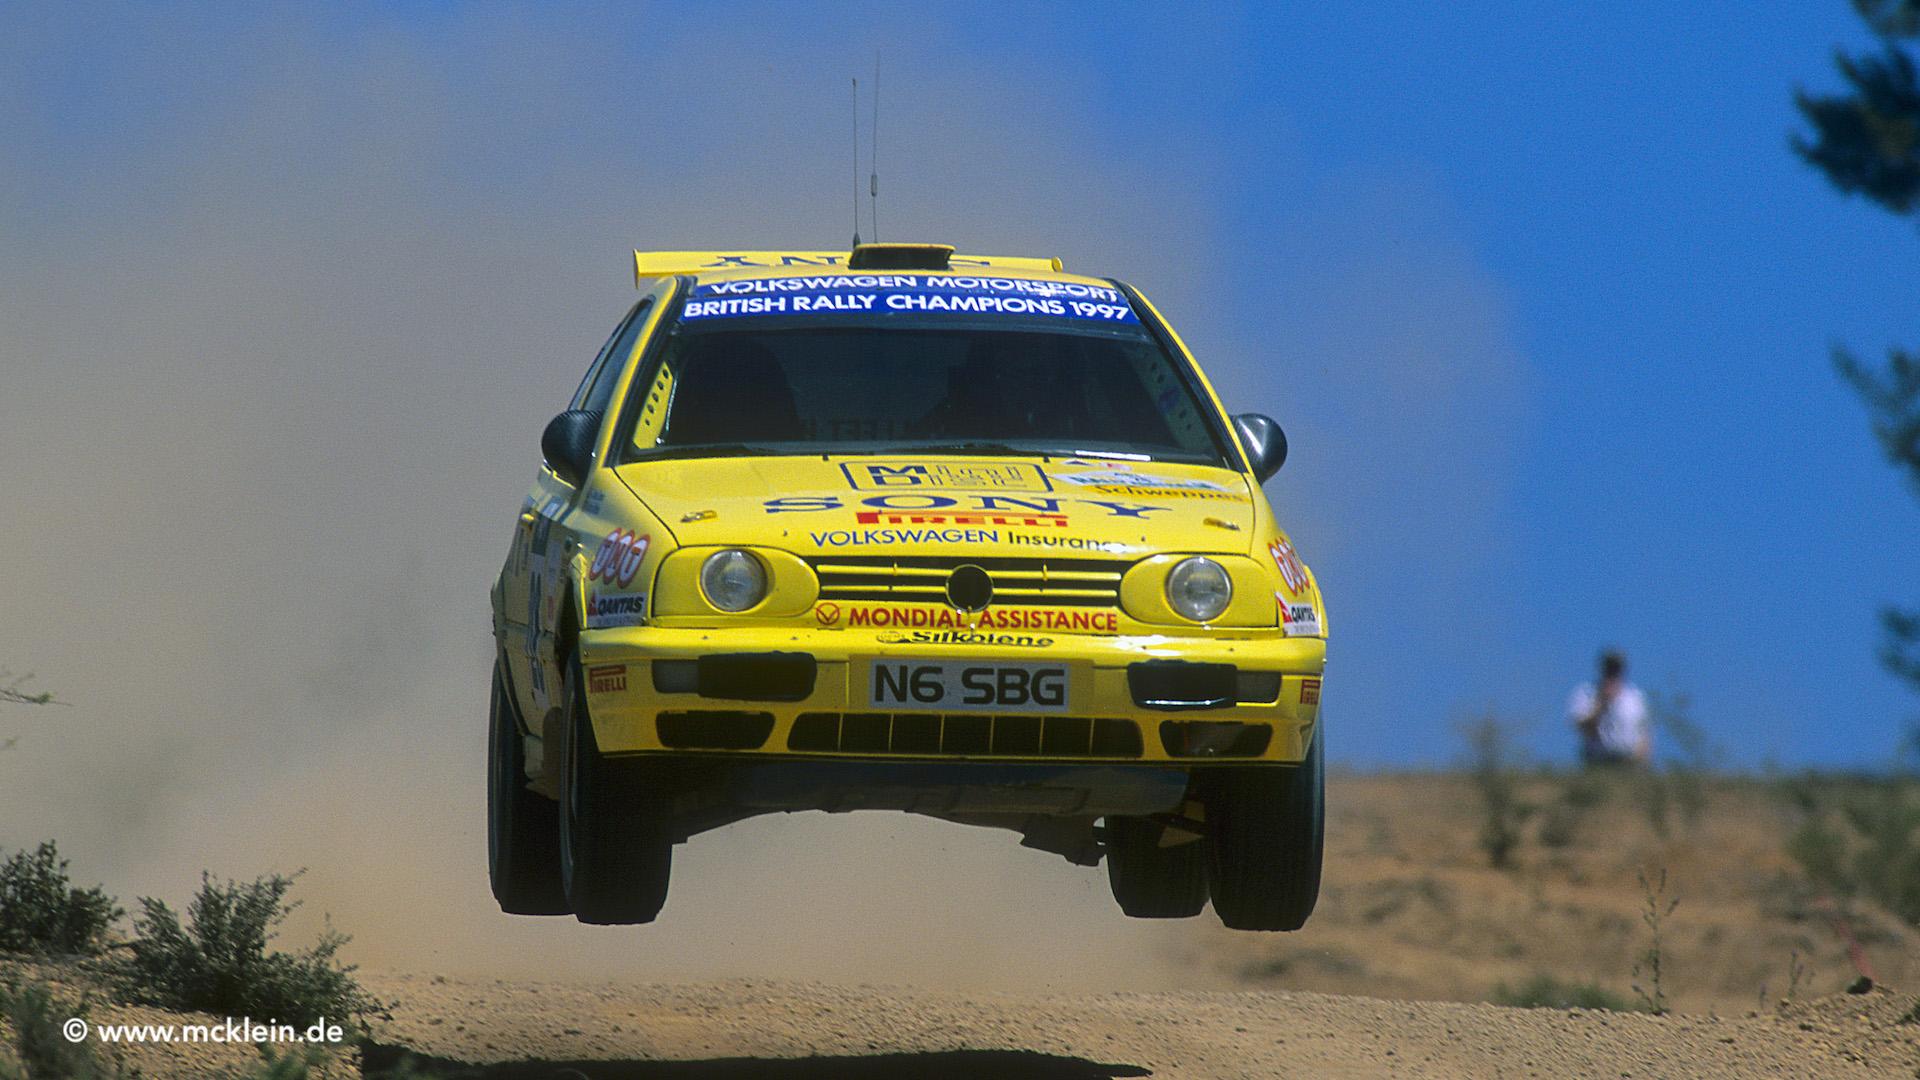 Golf 3 Kit Car 1997 / Ex Alister McRae Car